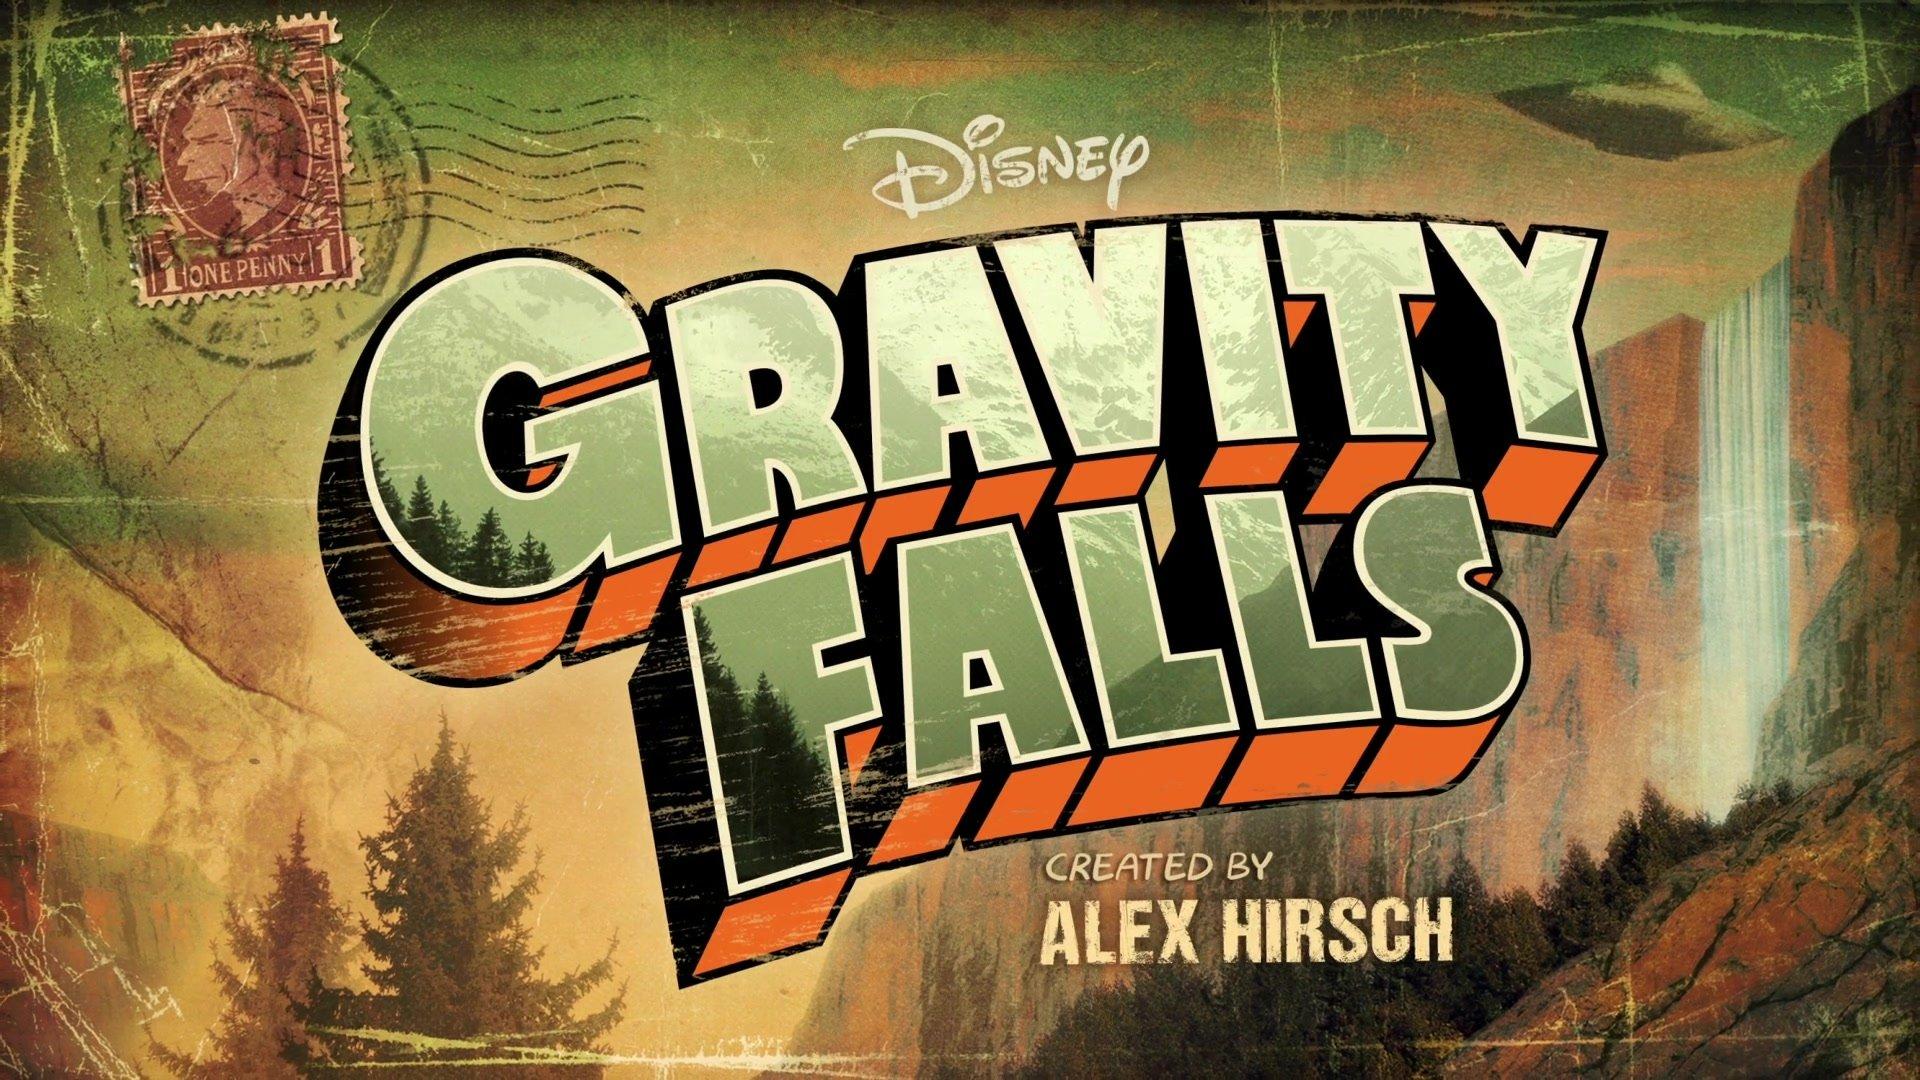 Gravity Falls Wallpaper Iphone 4 Gravity Falls Fondo De Pantalla Hd Fondo De Escritorio